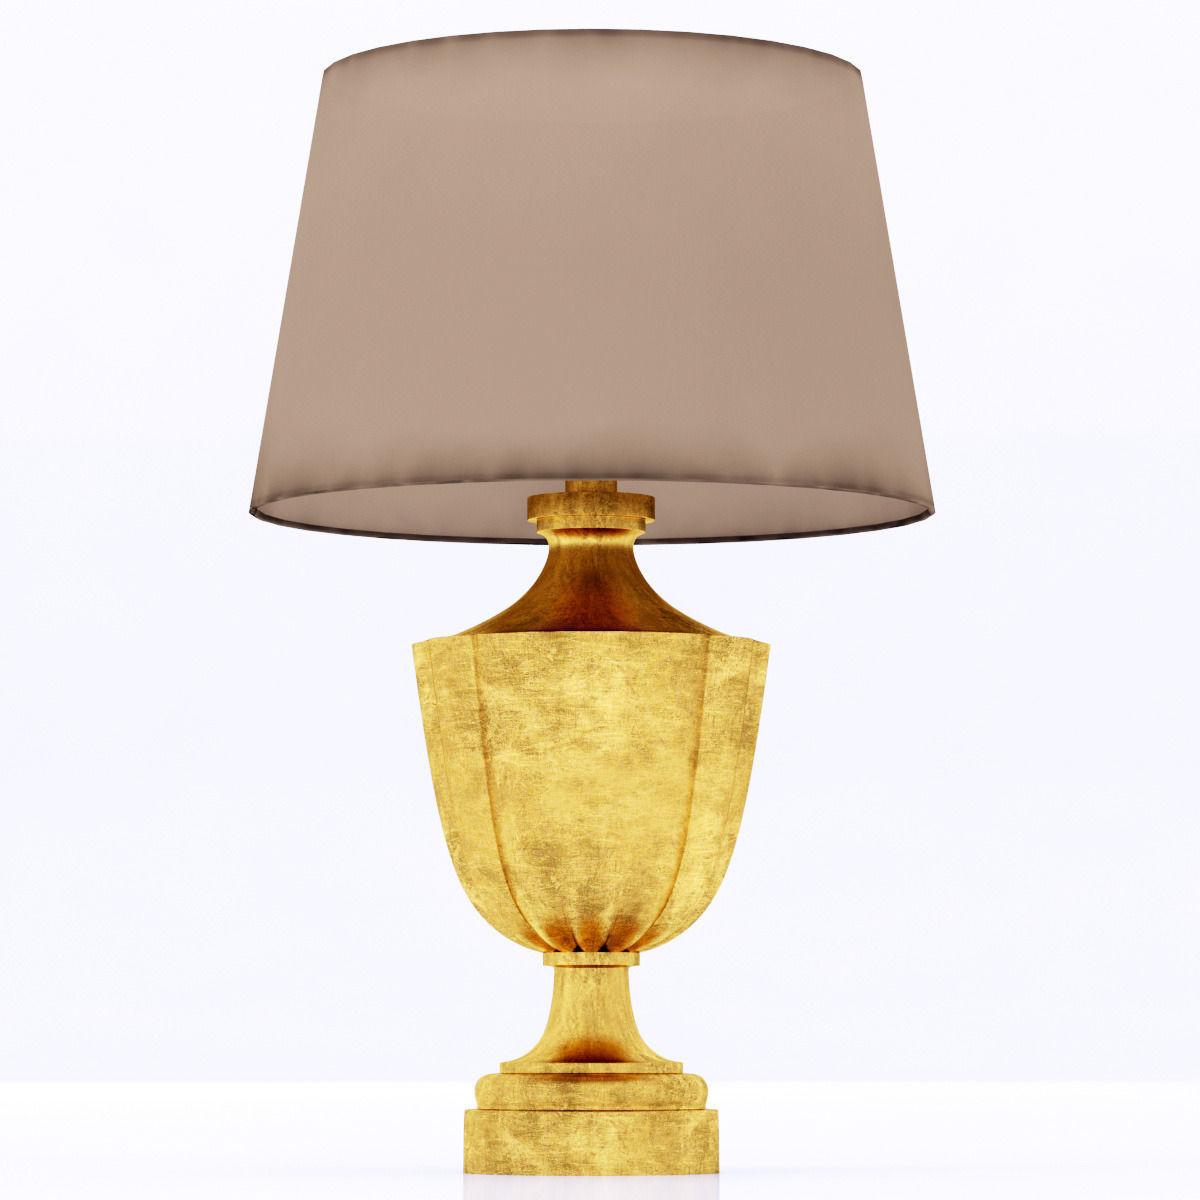 Circa Lighting Marlborough Table Lamp Model